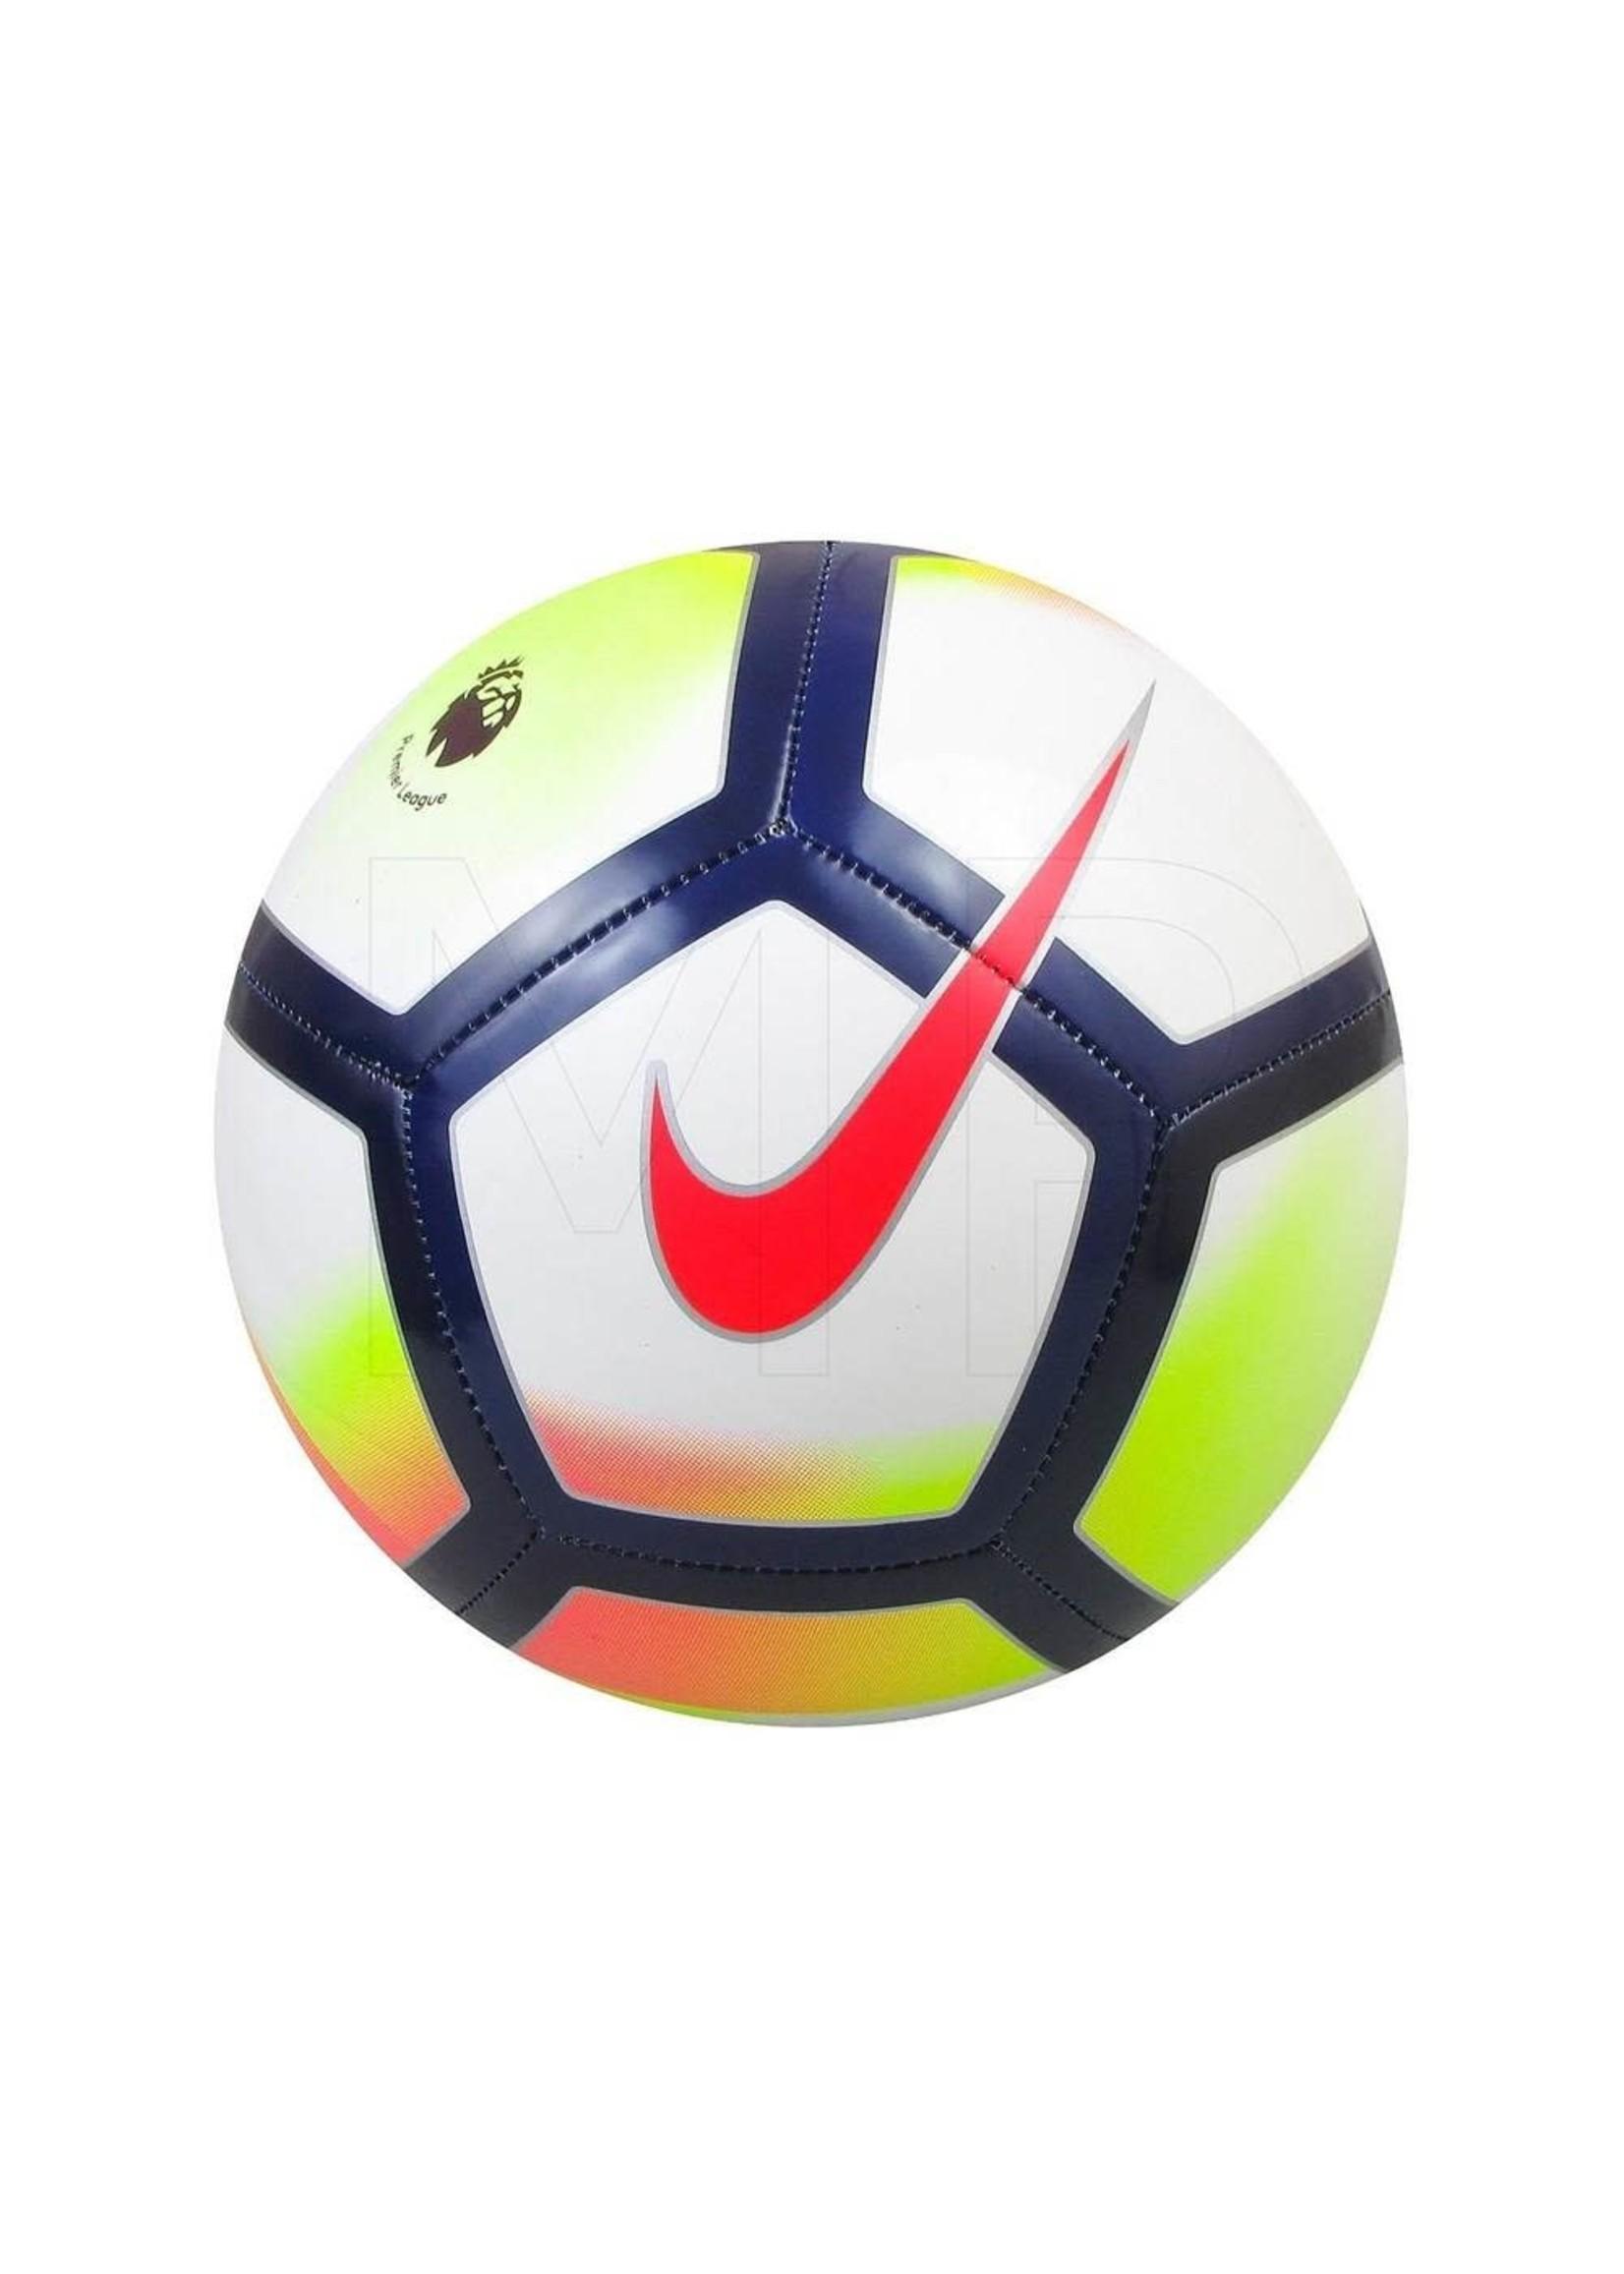 Nike PREMIER LEAGUE PITCH FOOTBALL 2020/21